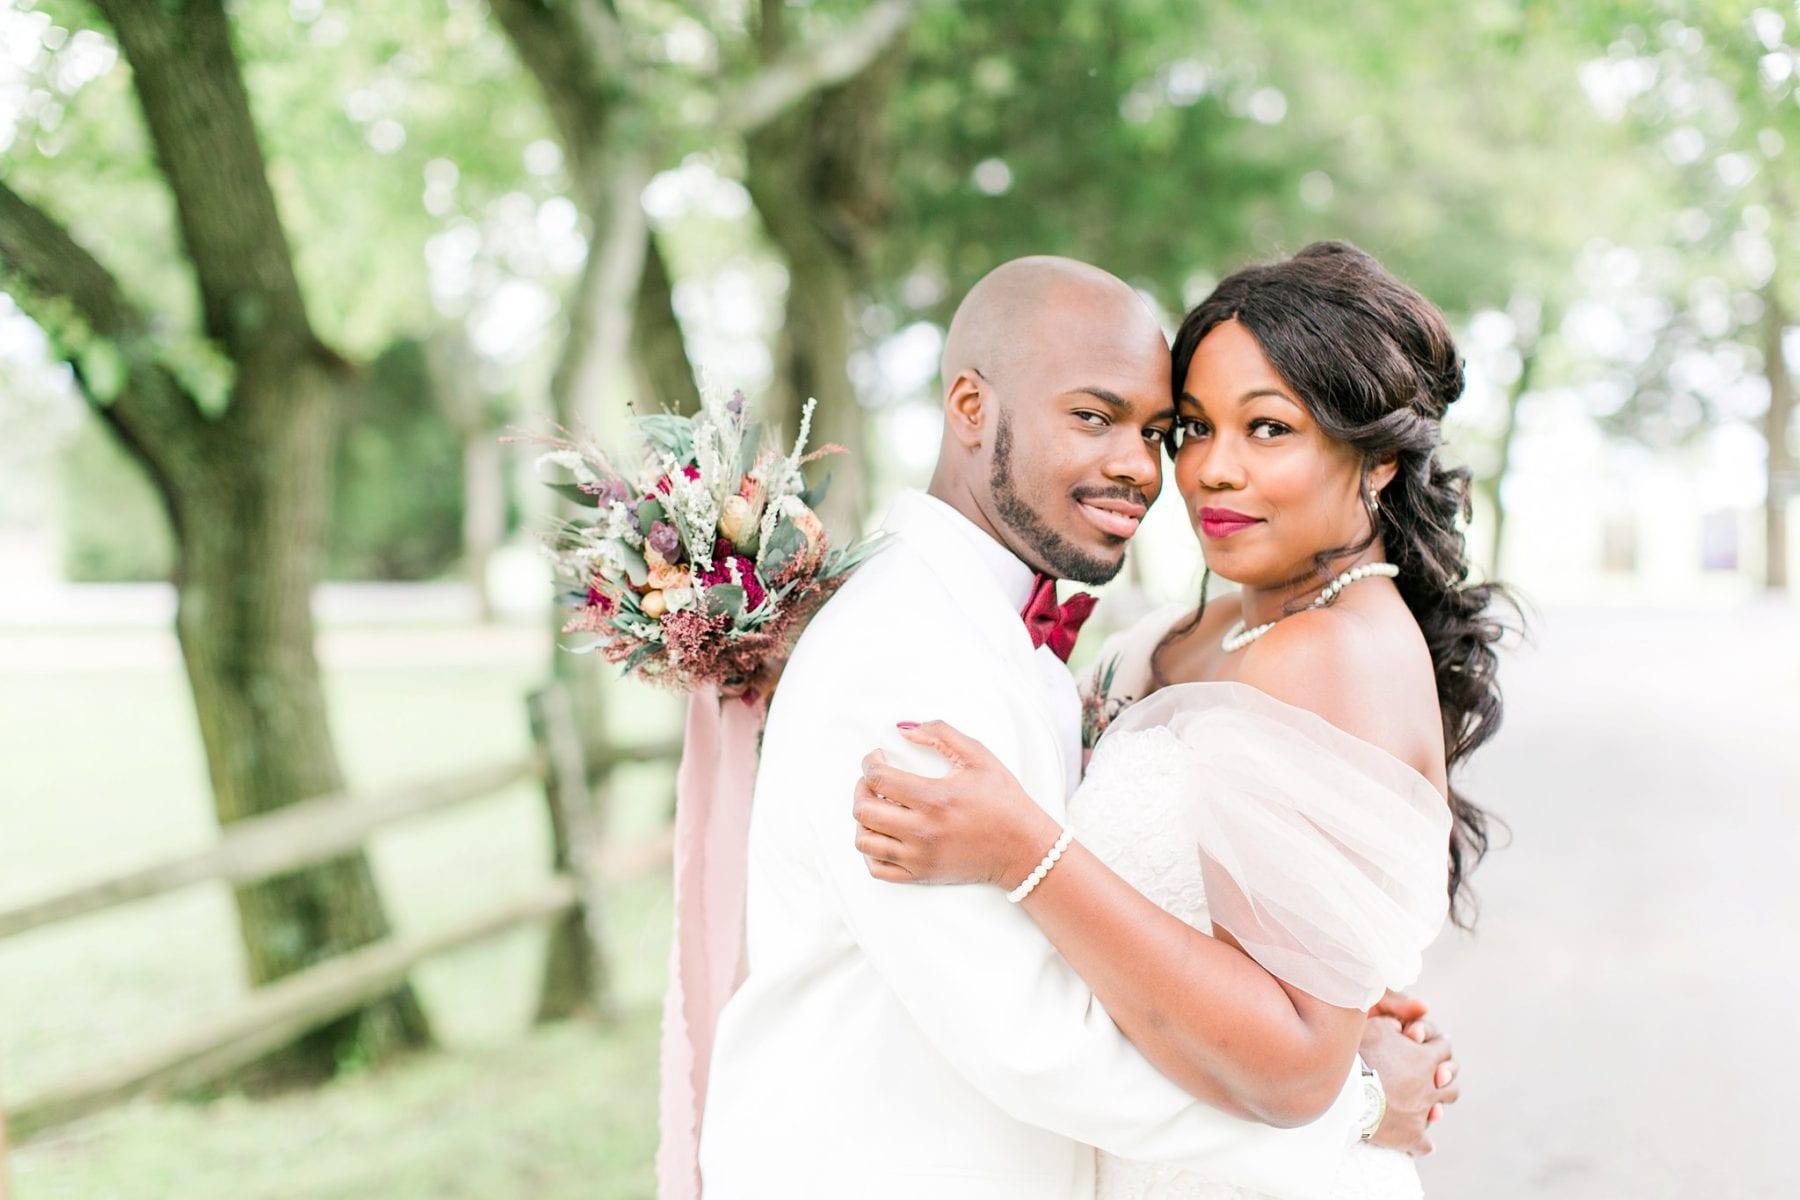 Jefferson Patterson Park Wedding Maryland Wedding Photographer Megan Kelsey Photography Jasmine & Seyi-44.jpg